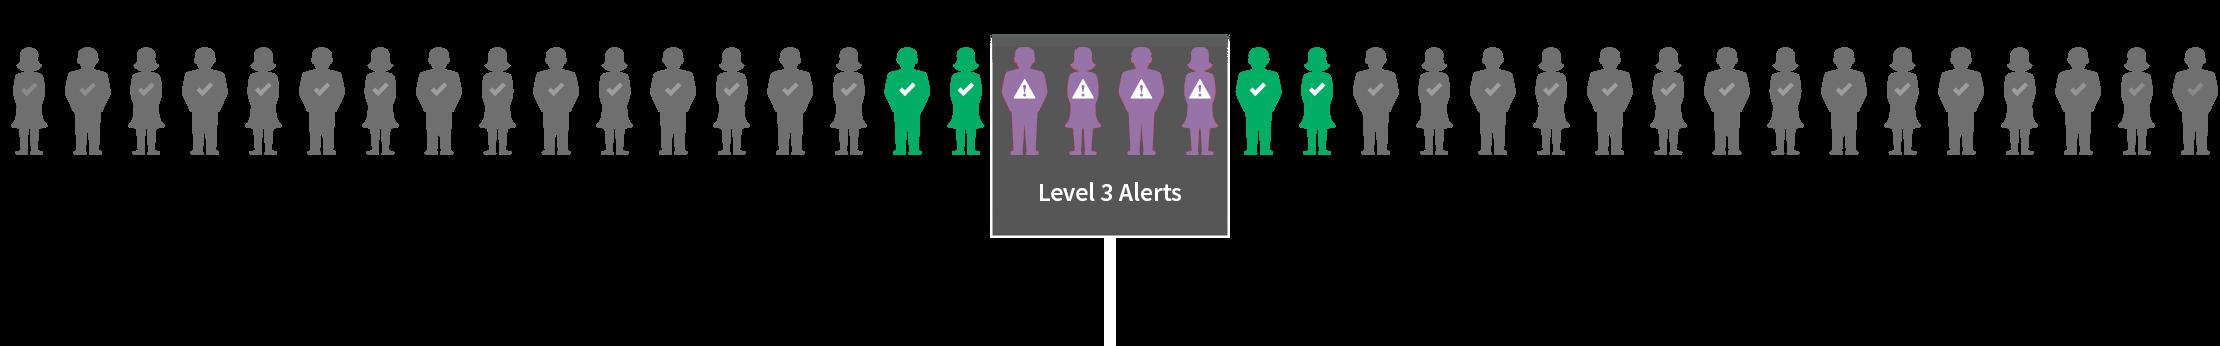 Level 3 Alerts